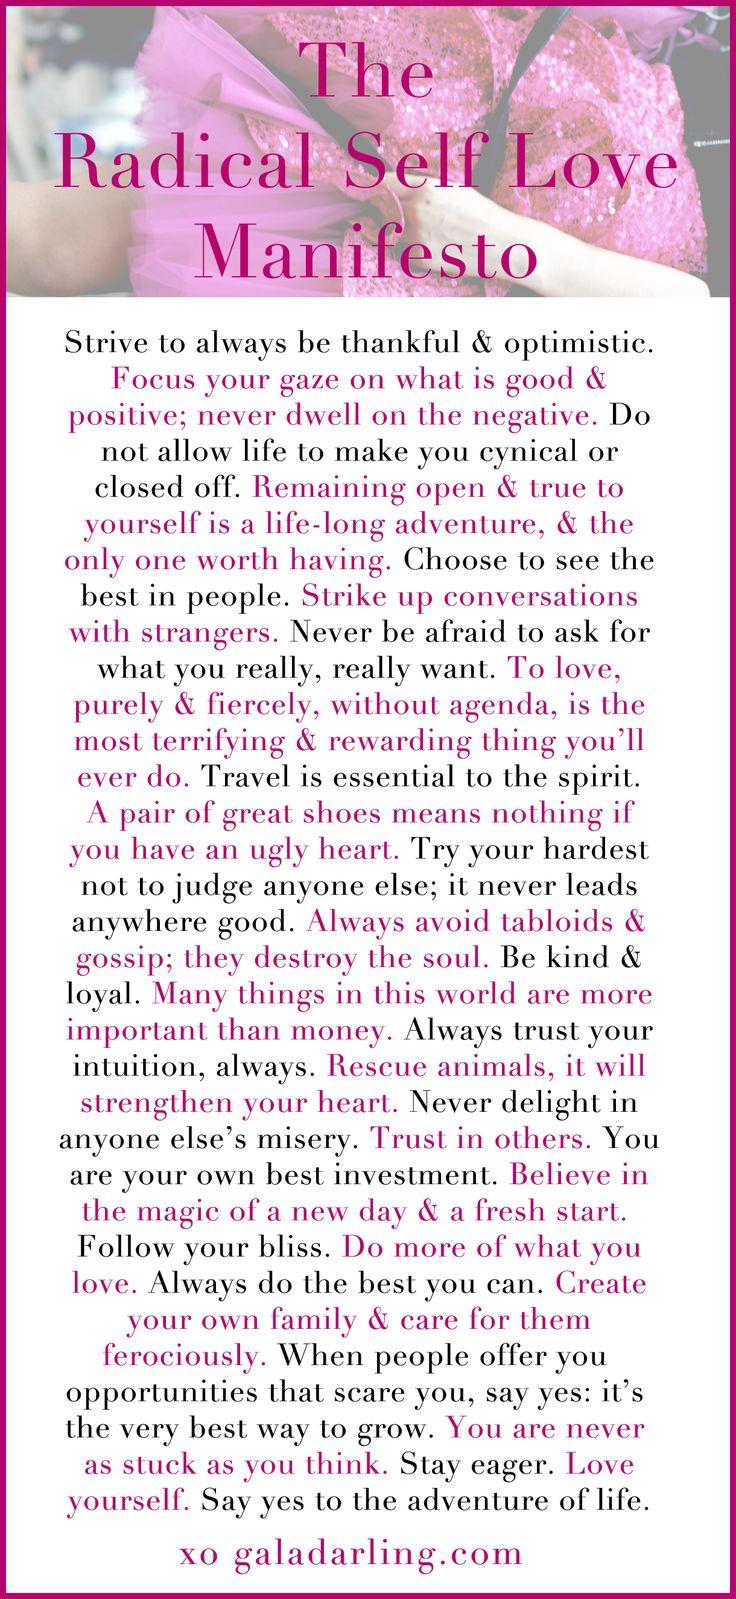 Radical Self Love Manifesto by Gala Darling